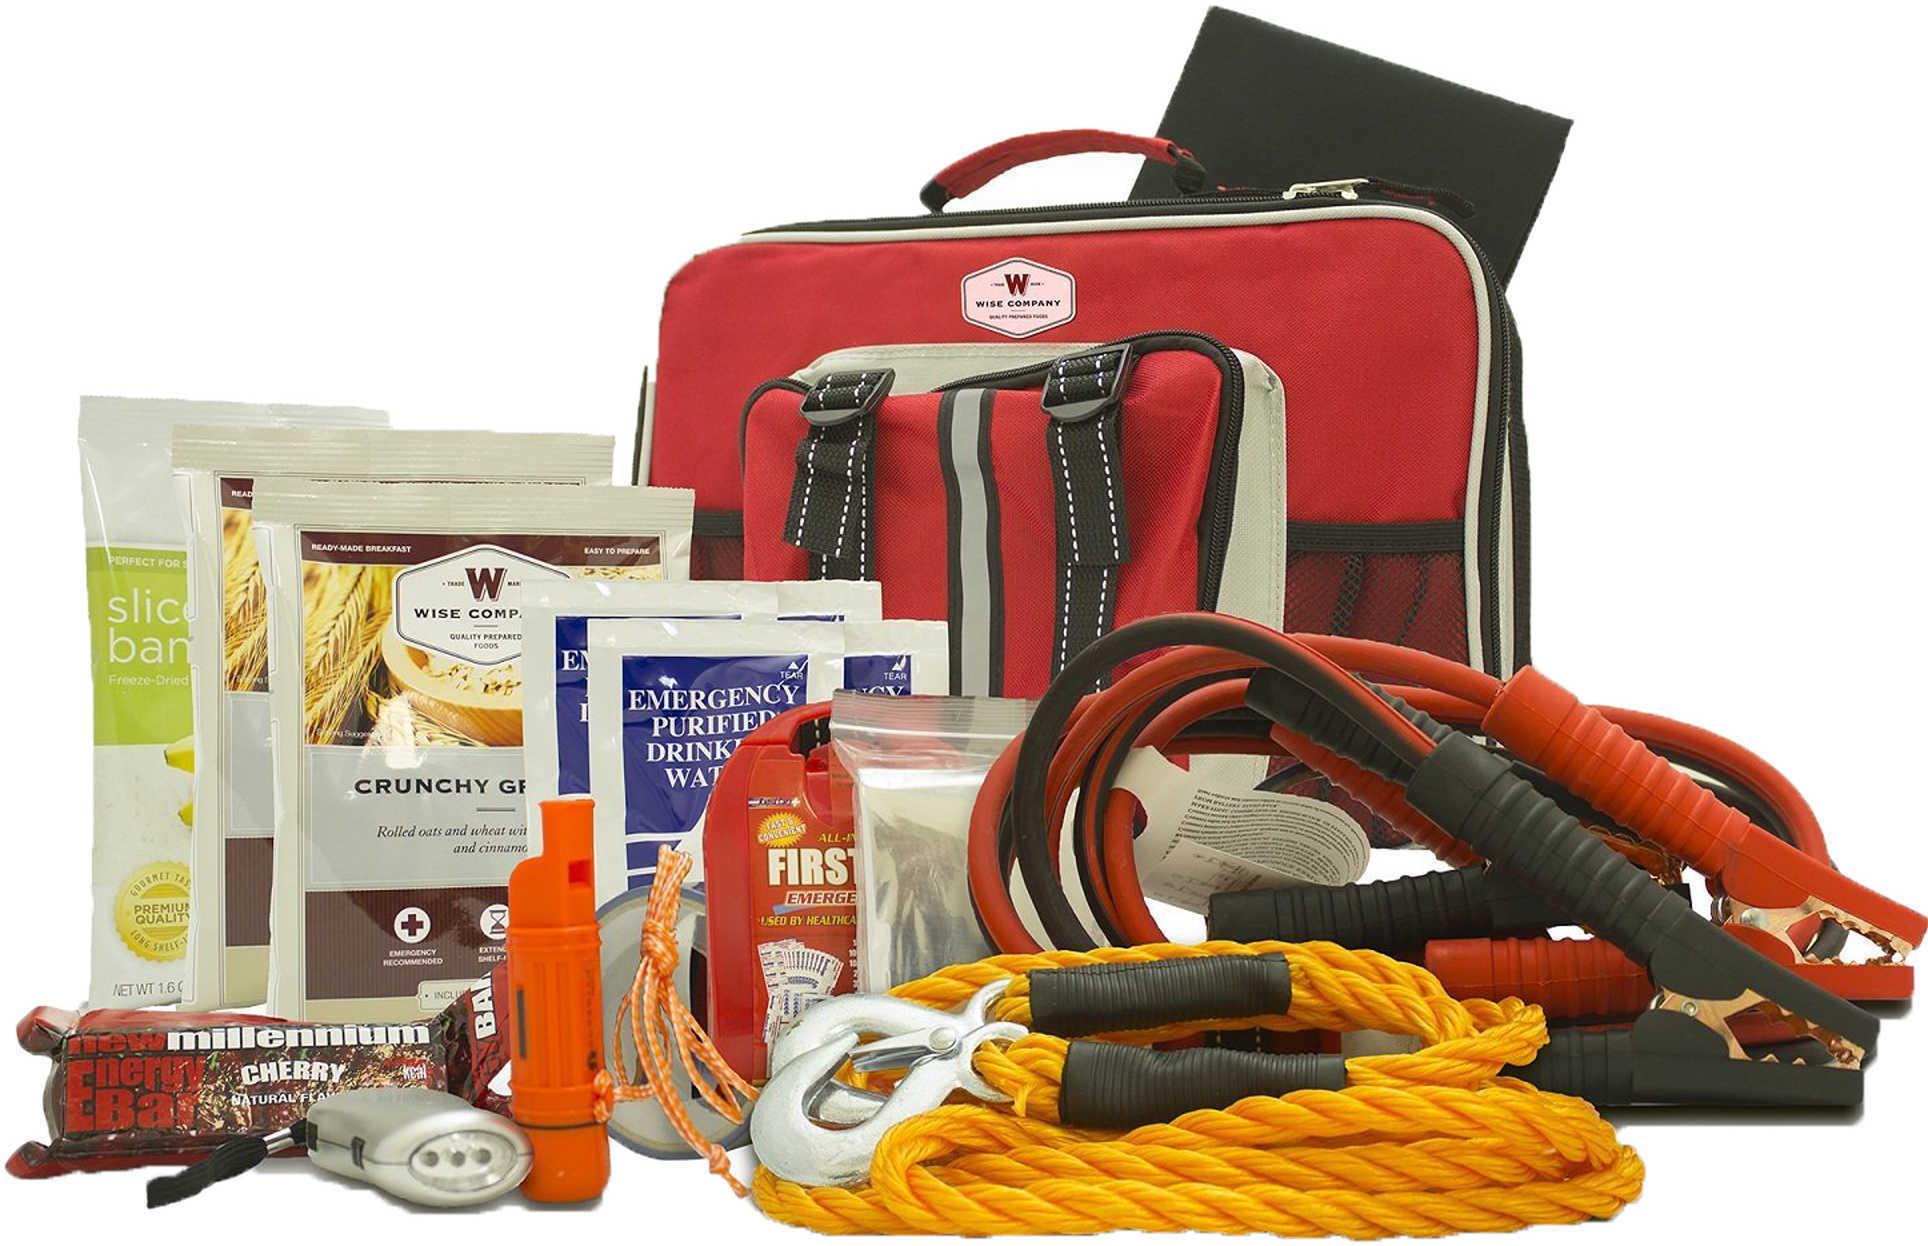 Wise Foods Ultimate Emergency Kit Ultimate Auto Preparedness Kit Md: 01-645